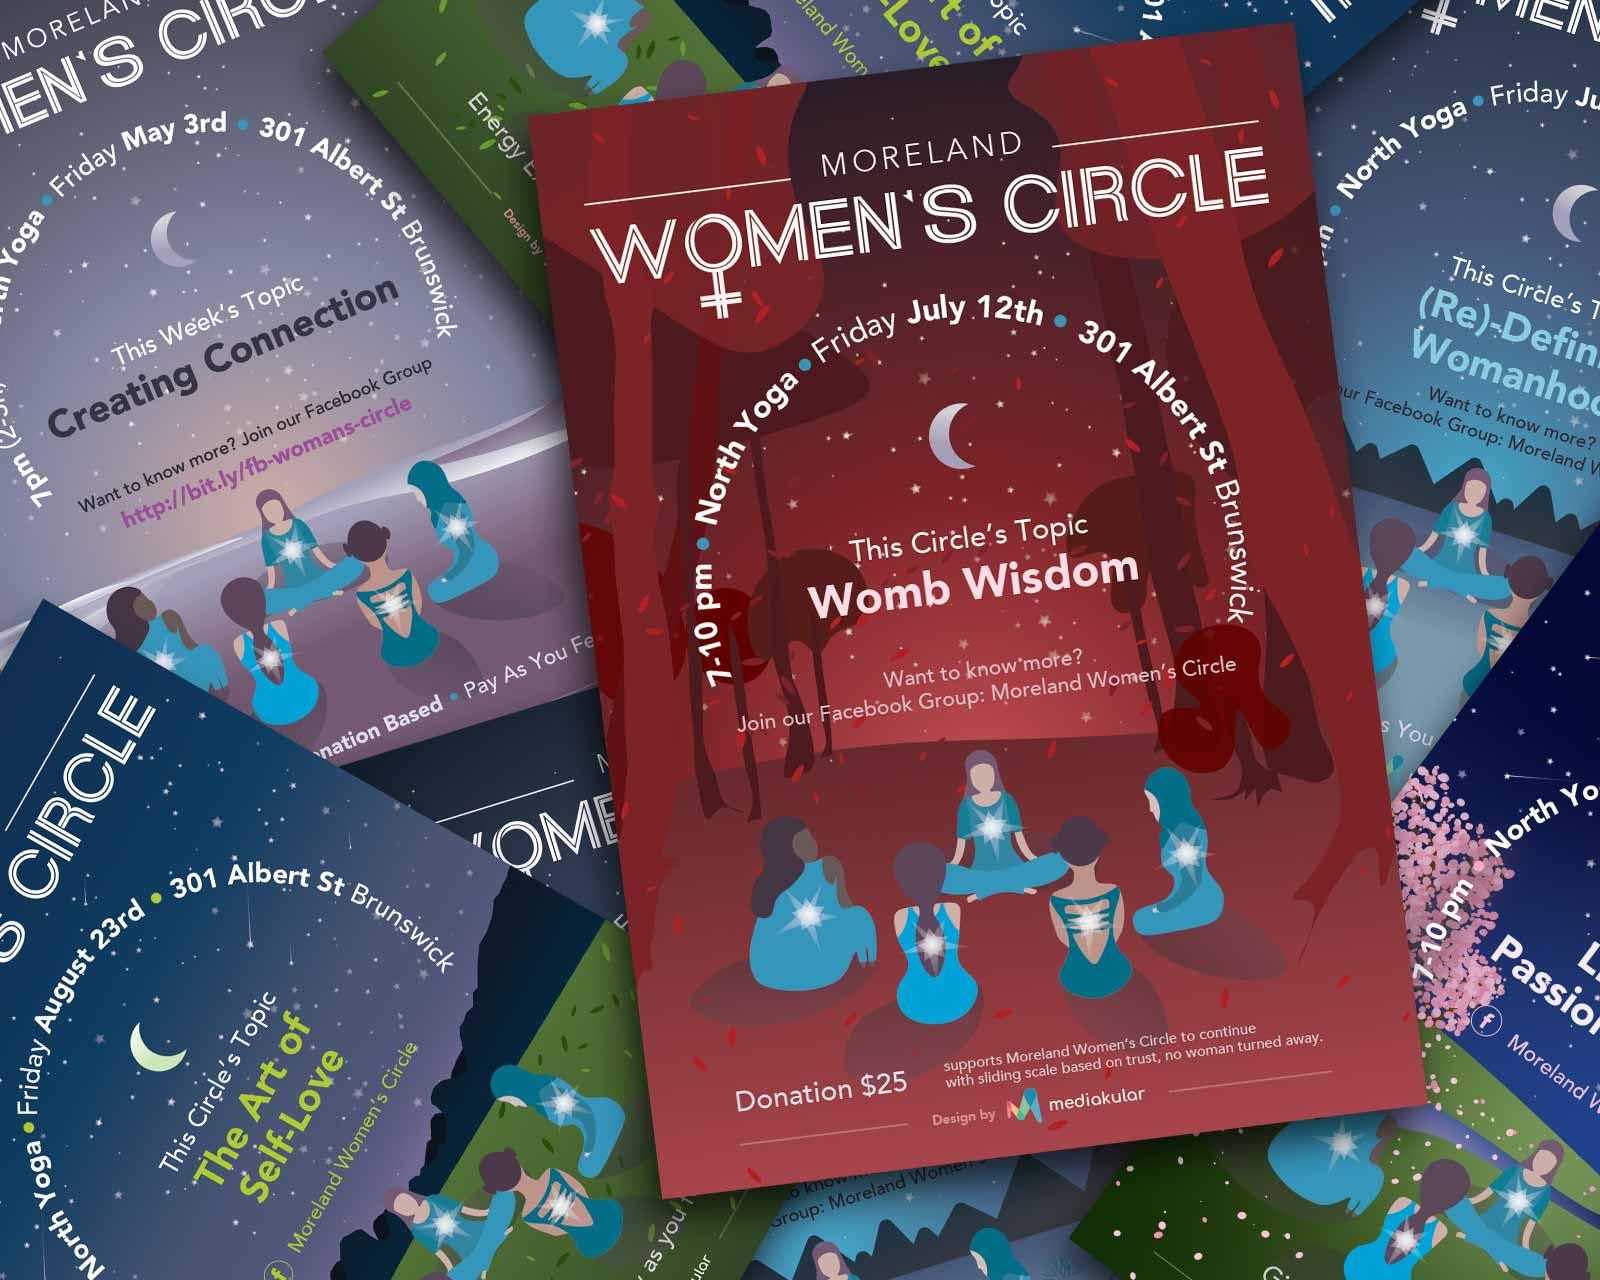 Moreland Woman's Circle Posters